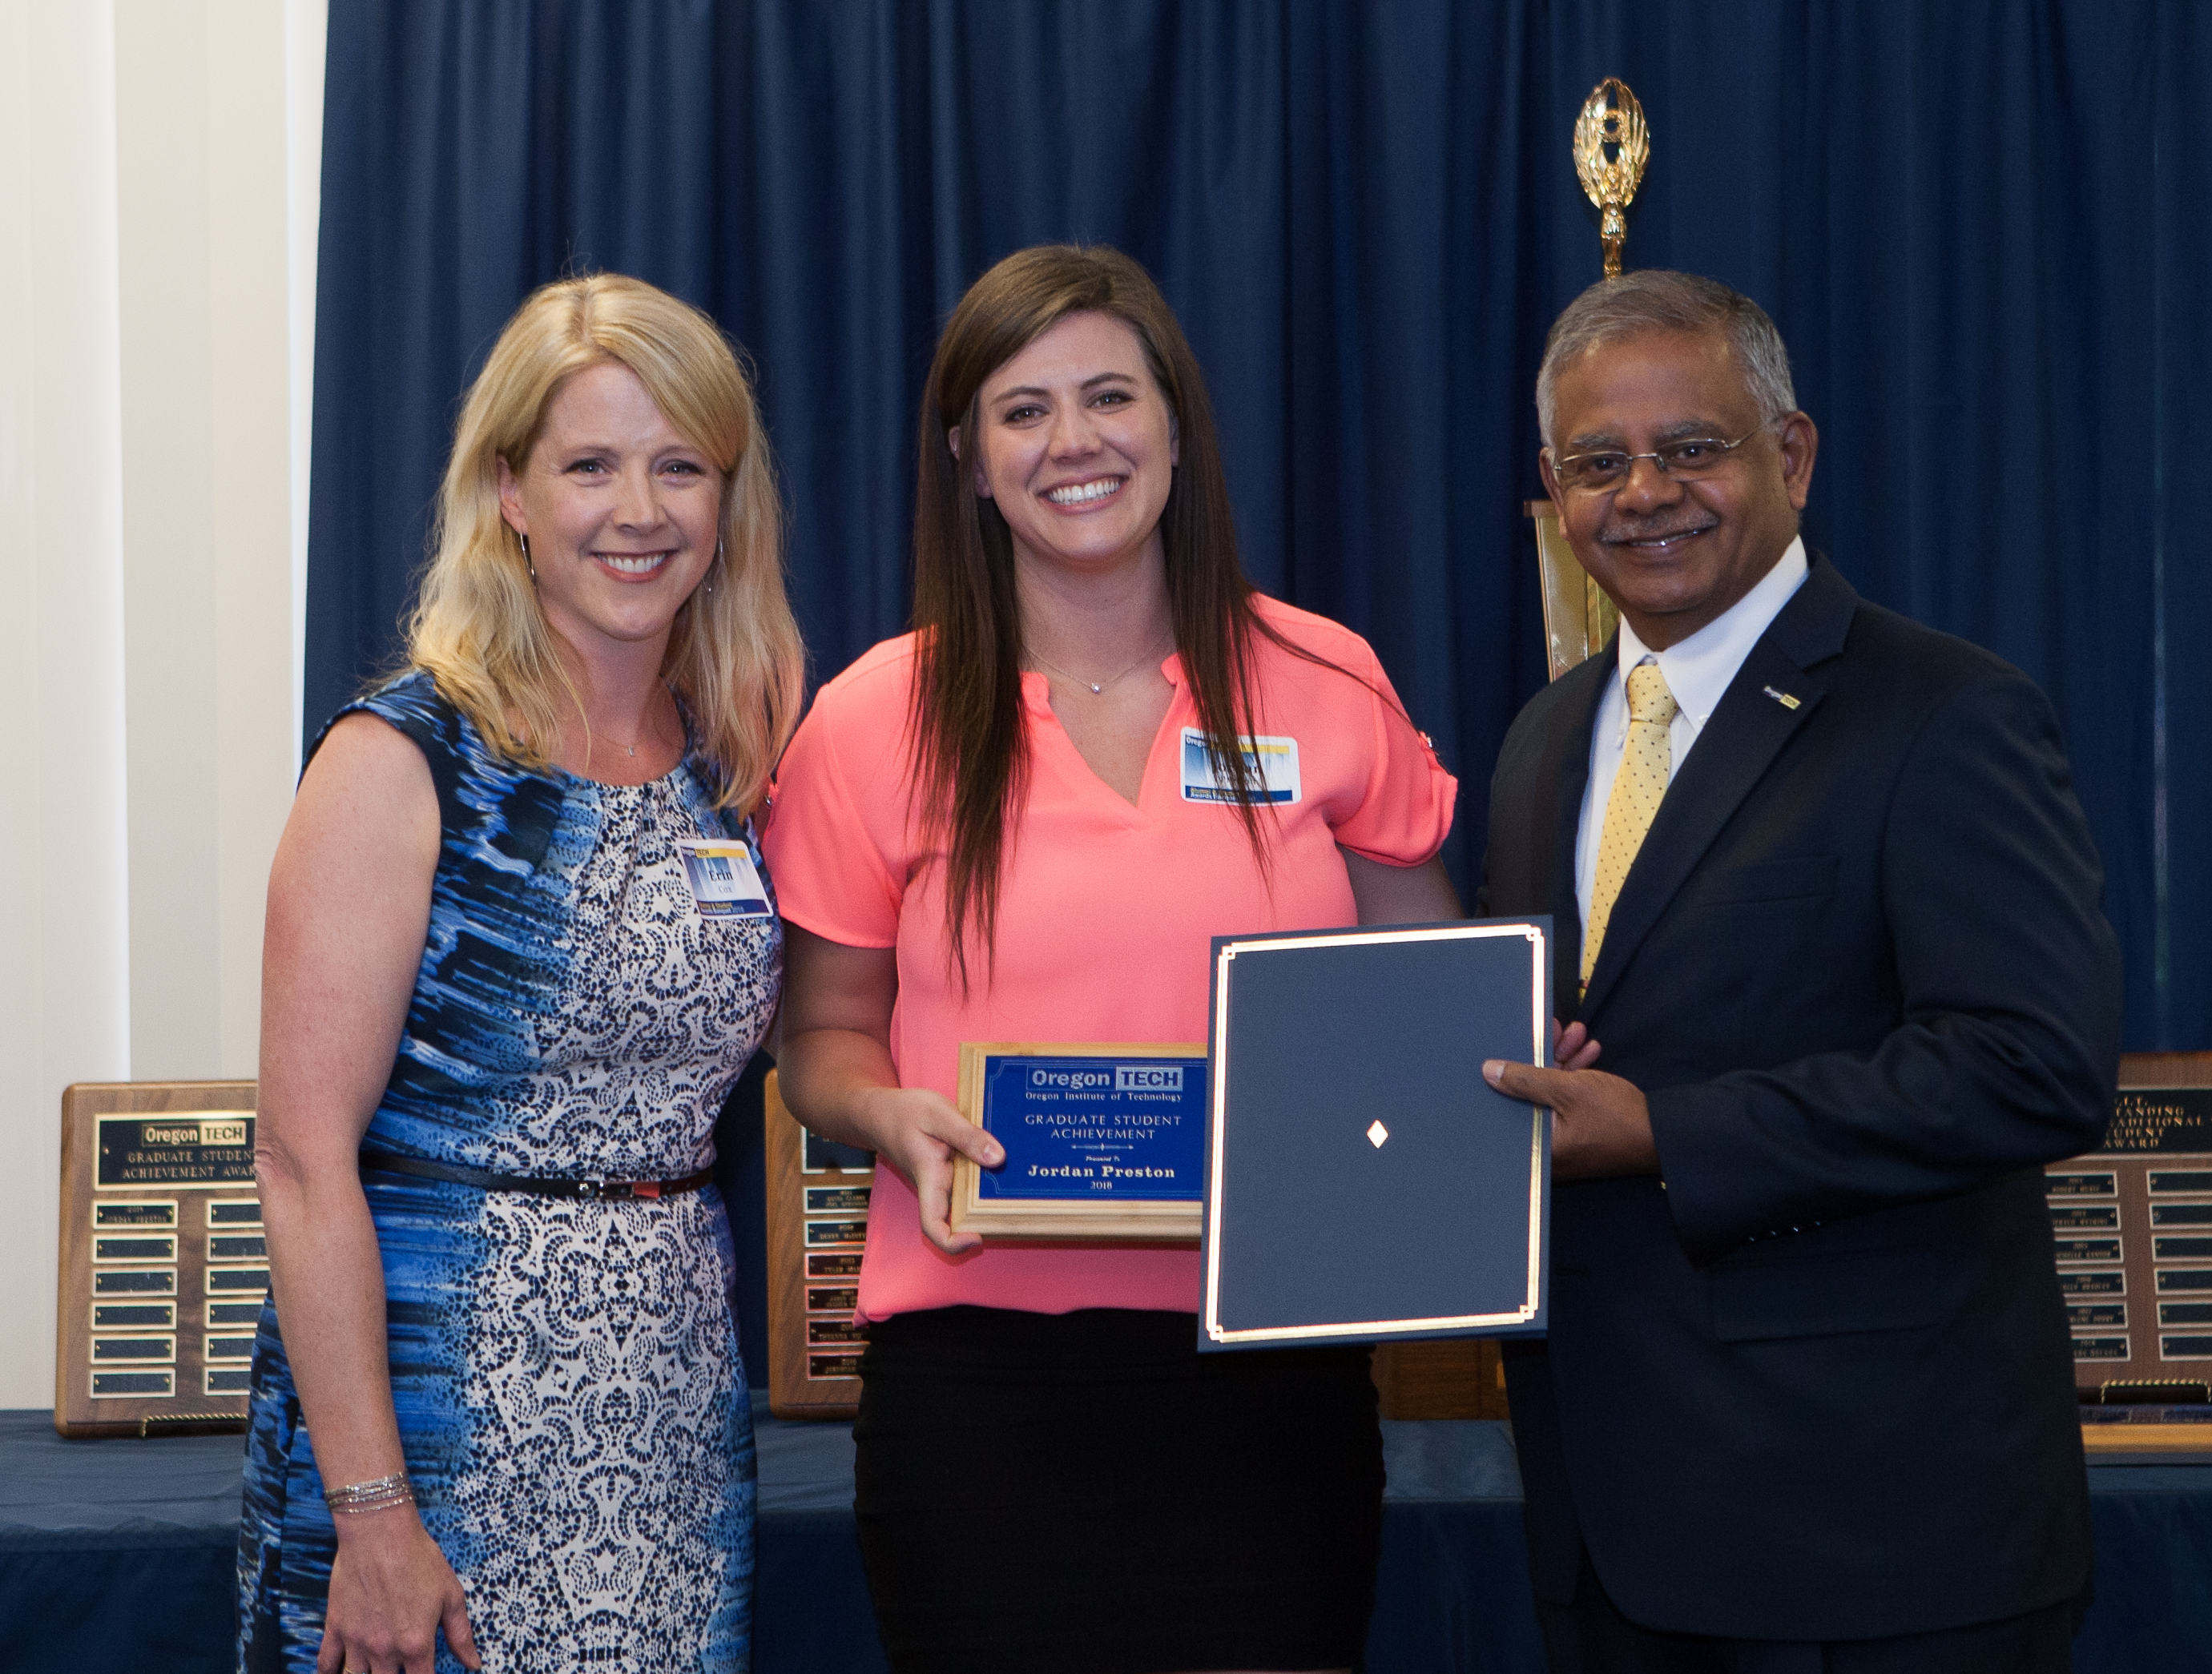 Outstanding Graduate Student: Jordan Preston